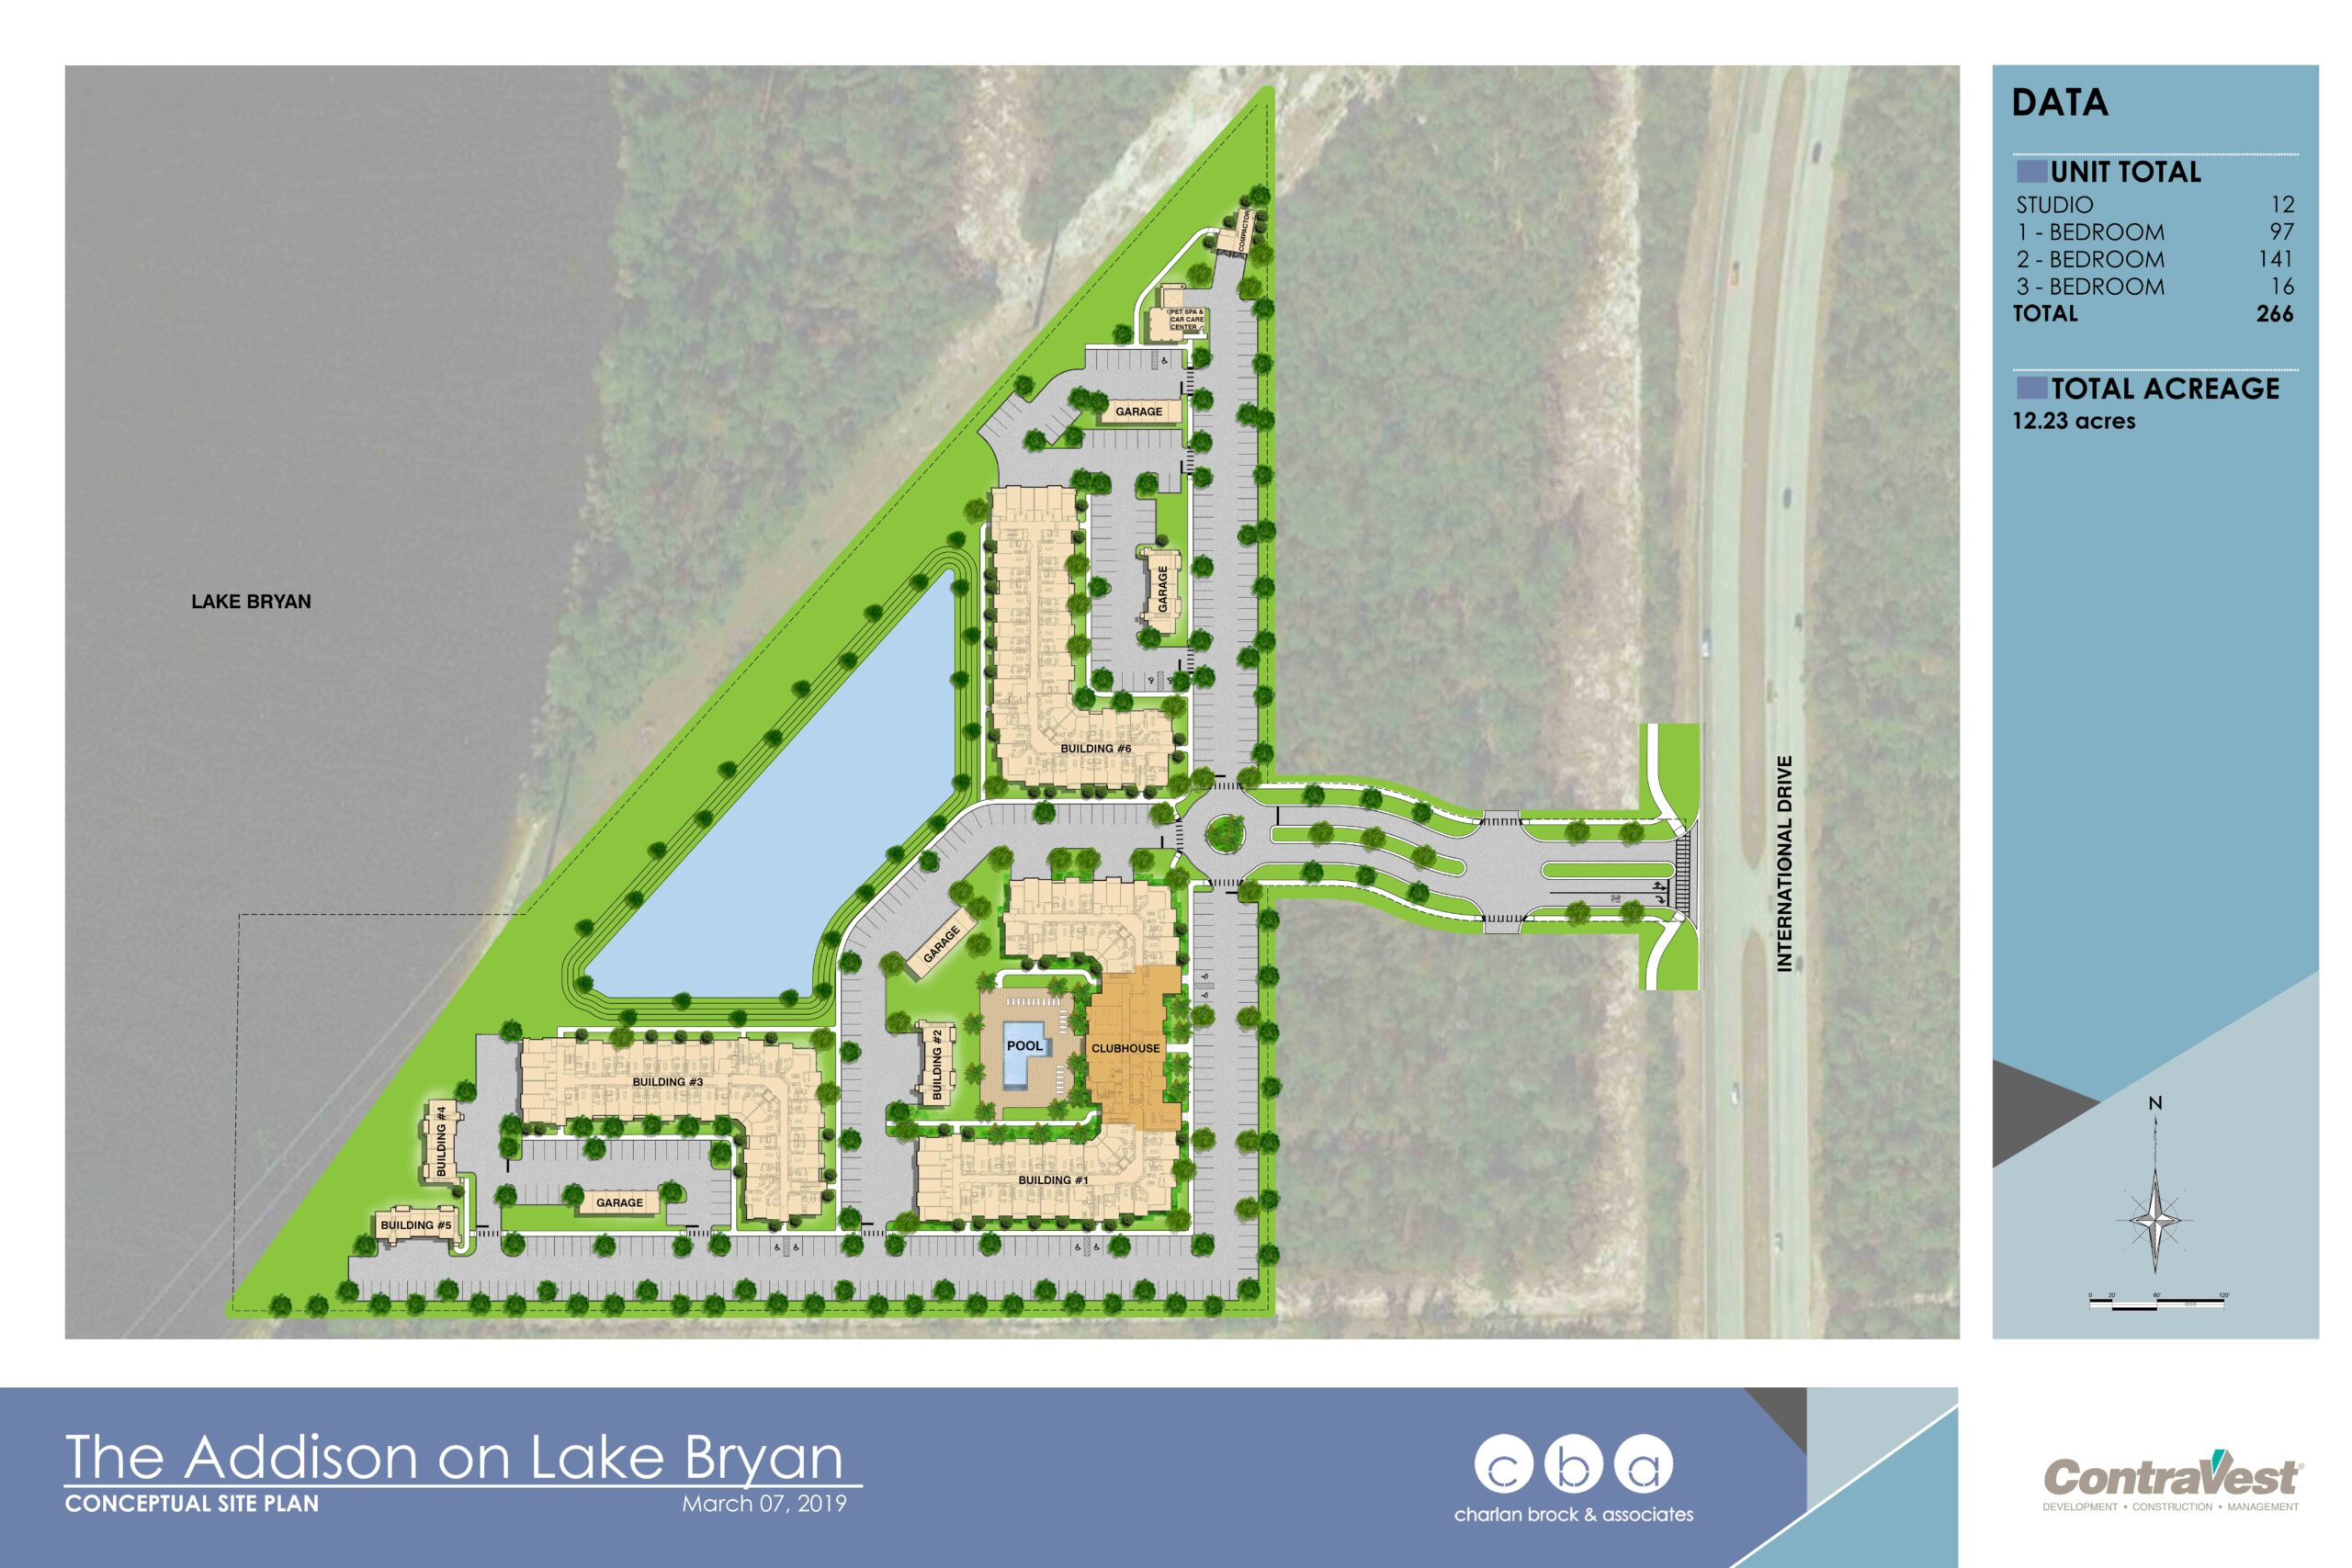 The Addison Lake Bryan Site Map